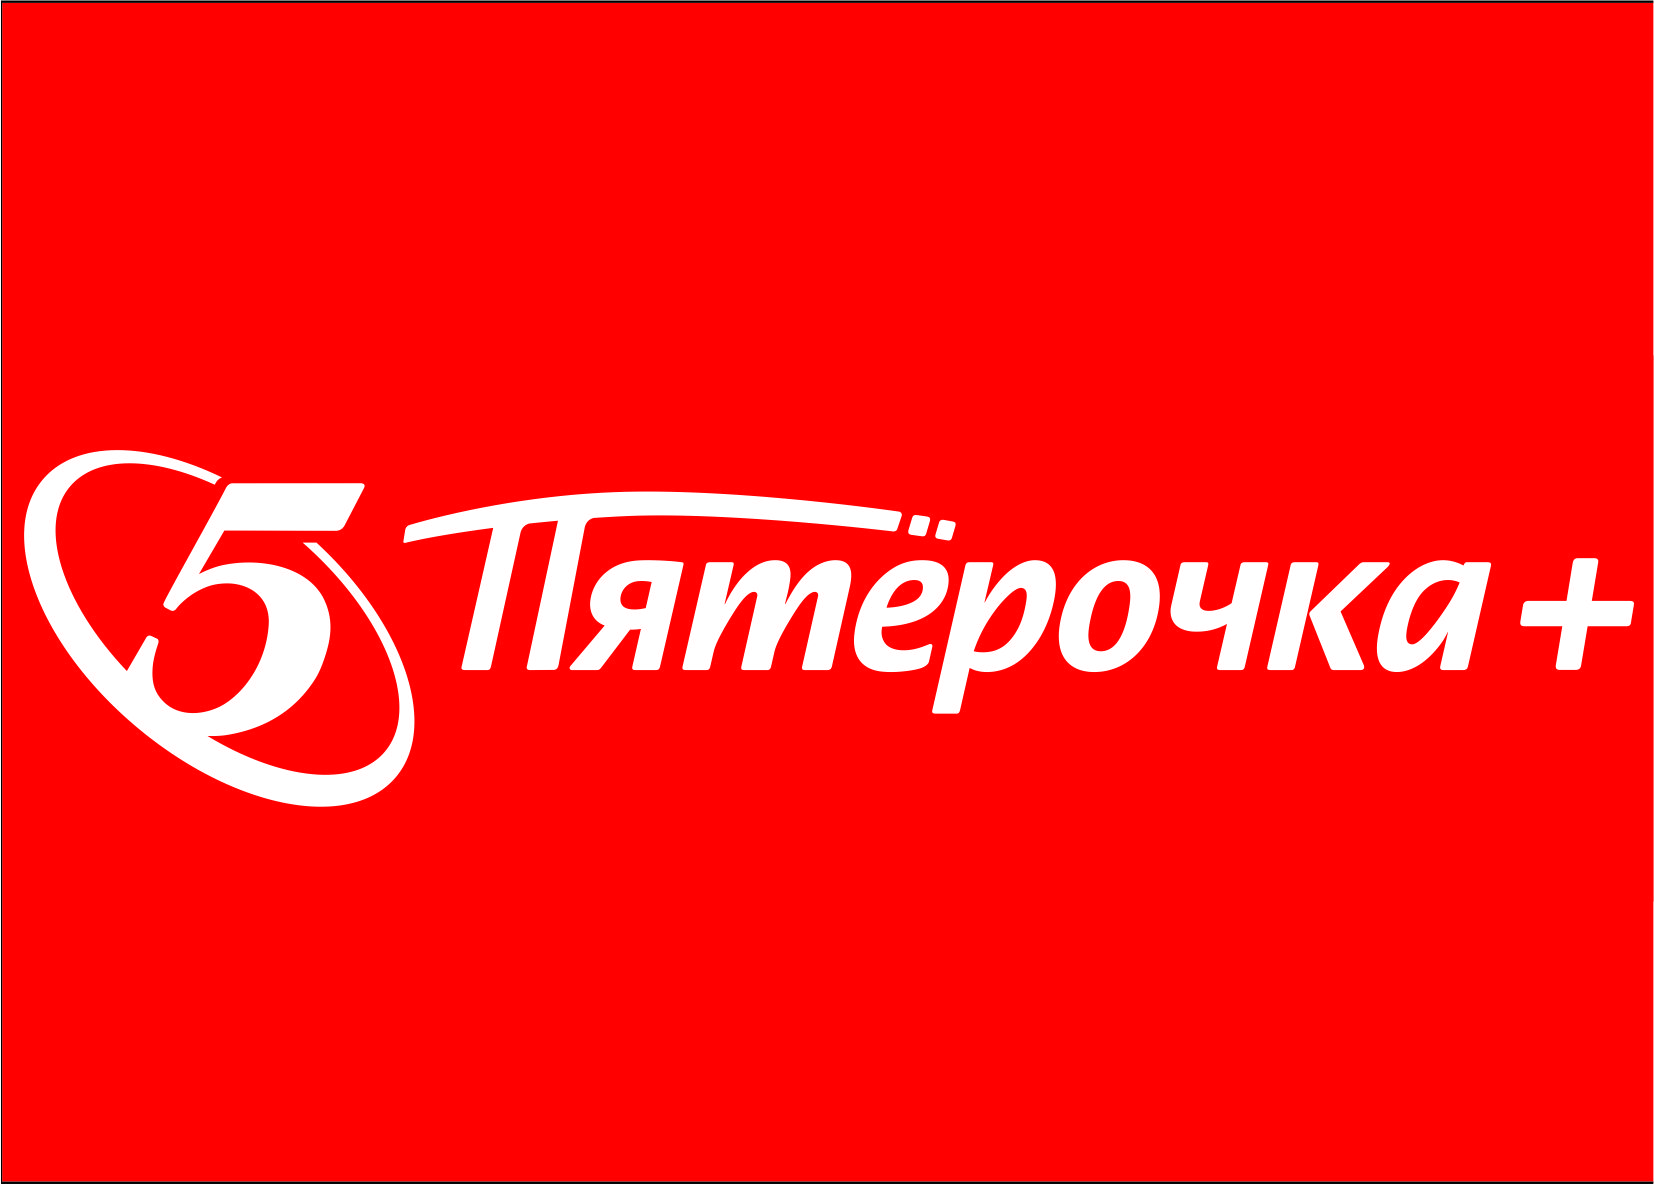 Логотип магазина пятерочка картинки